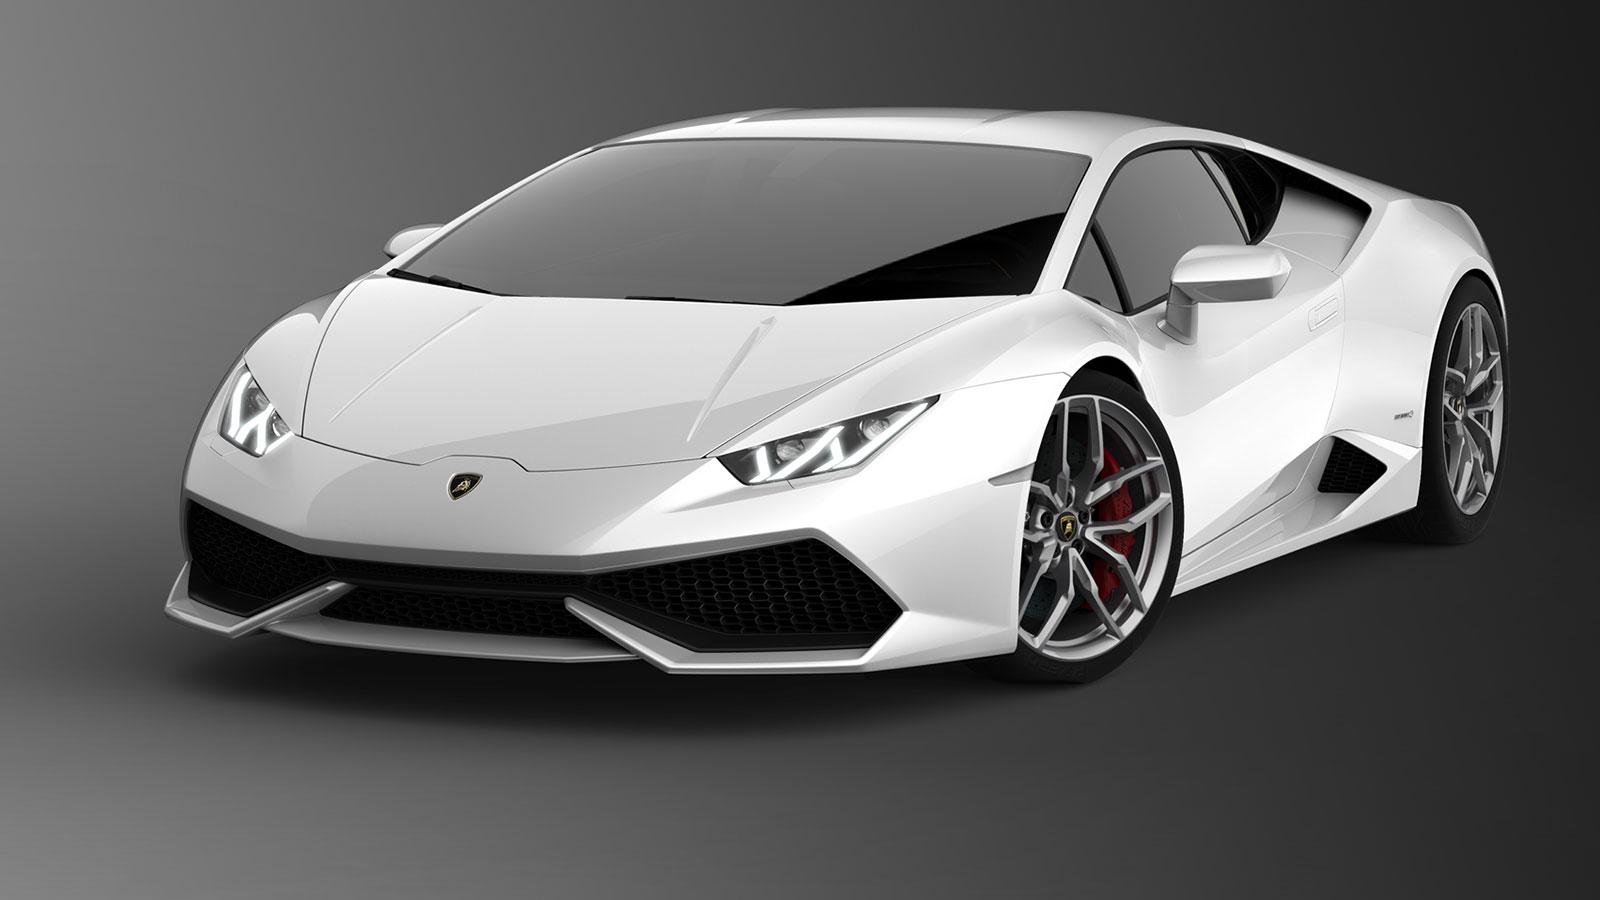 Lamborghini Huracan Lp 610 4 Car Body Design